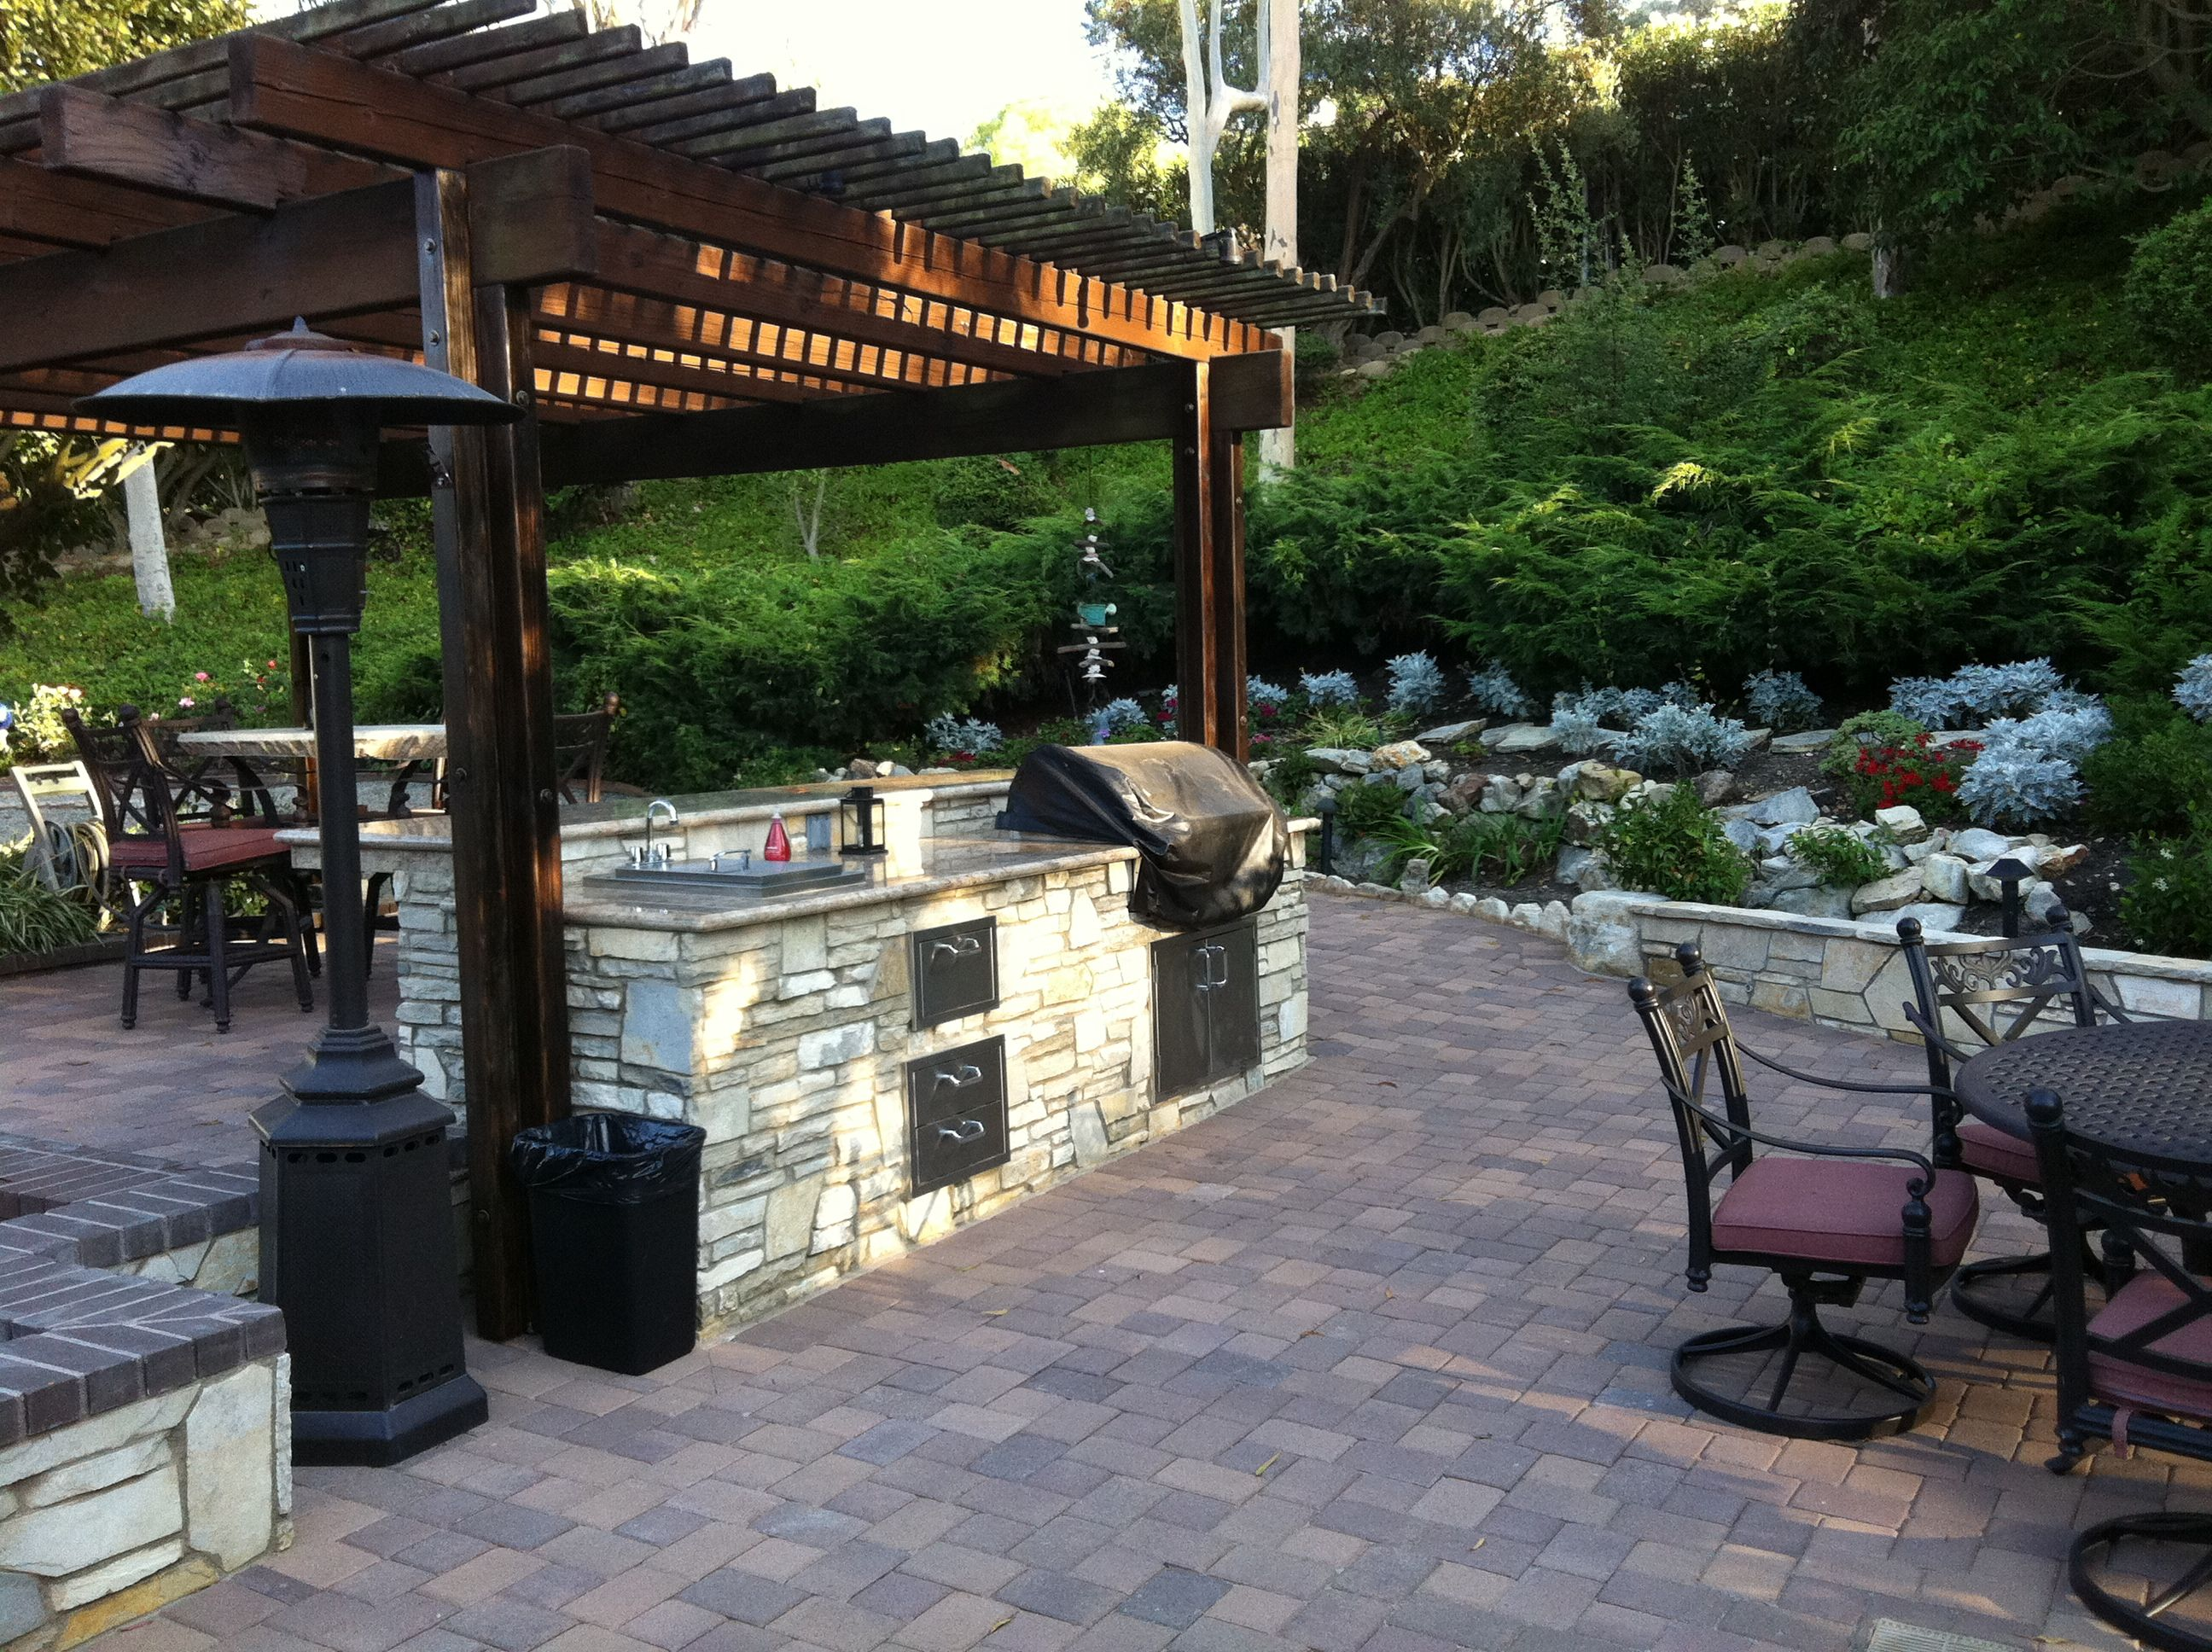 New patio, New BBQ island | Barbecue design, Patio ... on Backyard Patio Grill Island id=71757